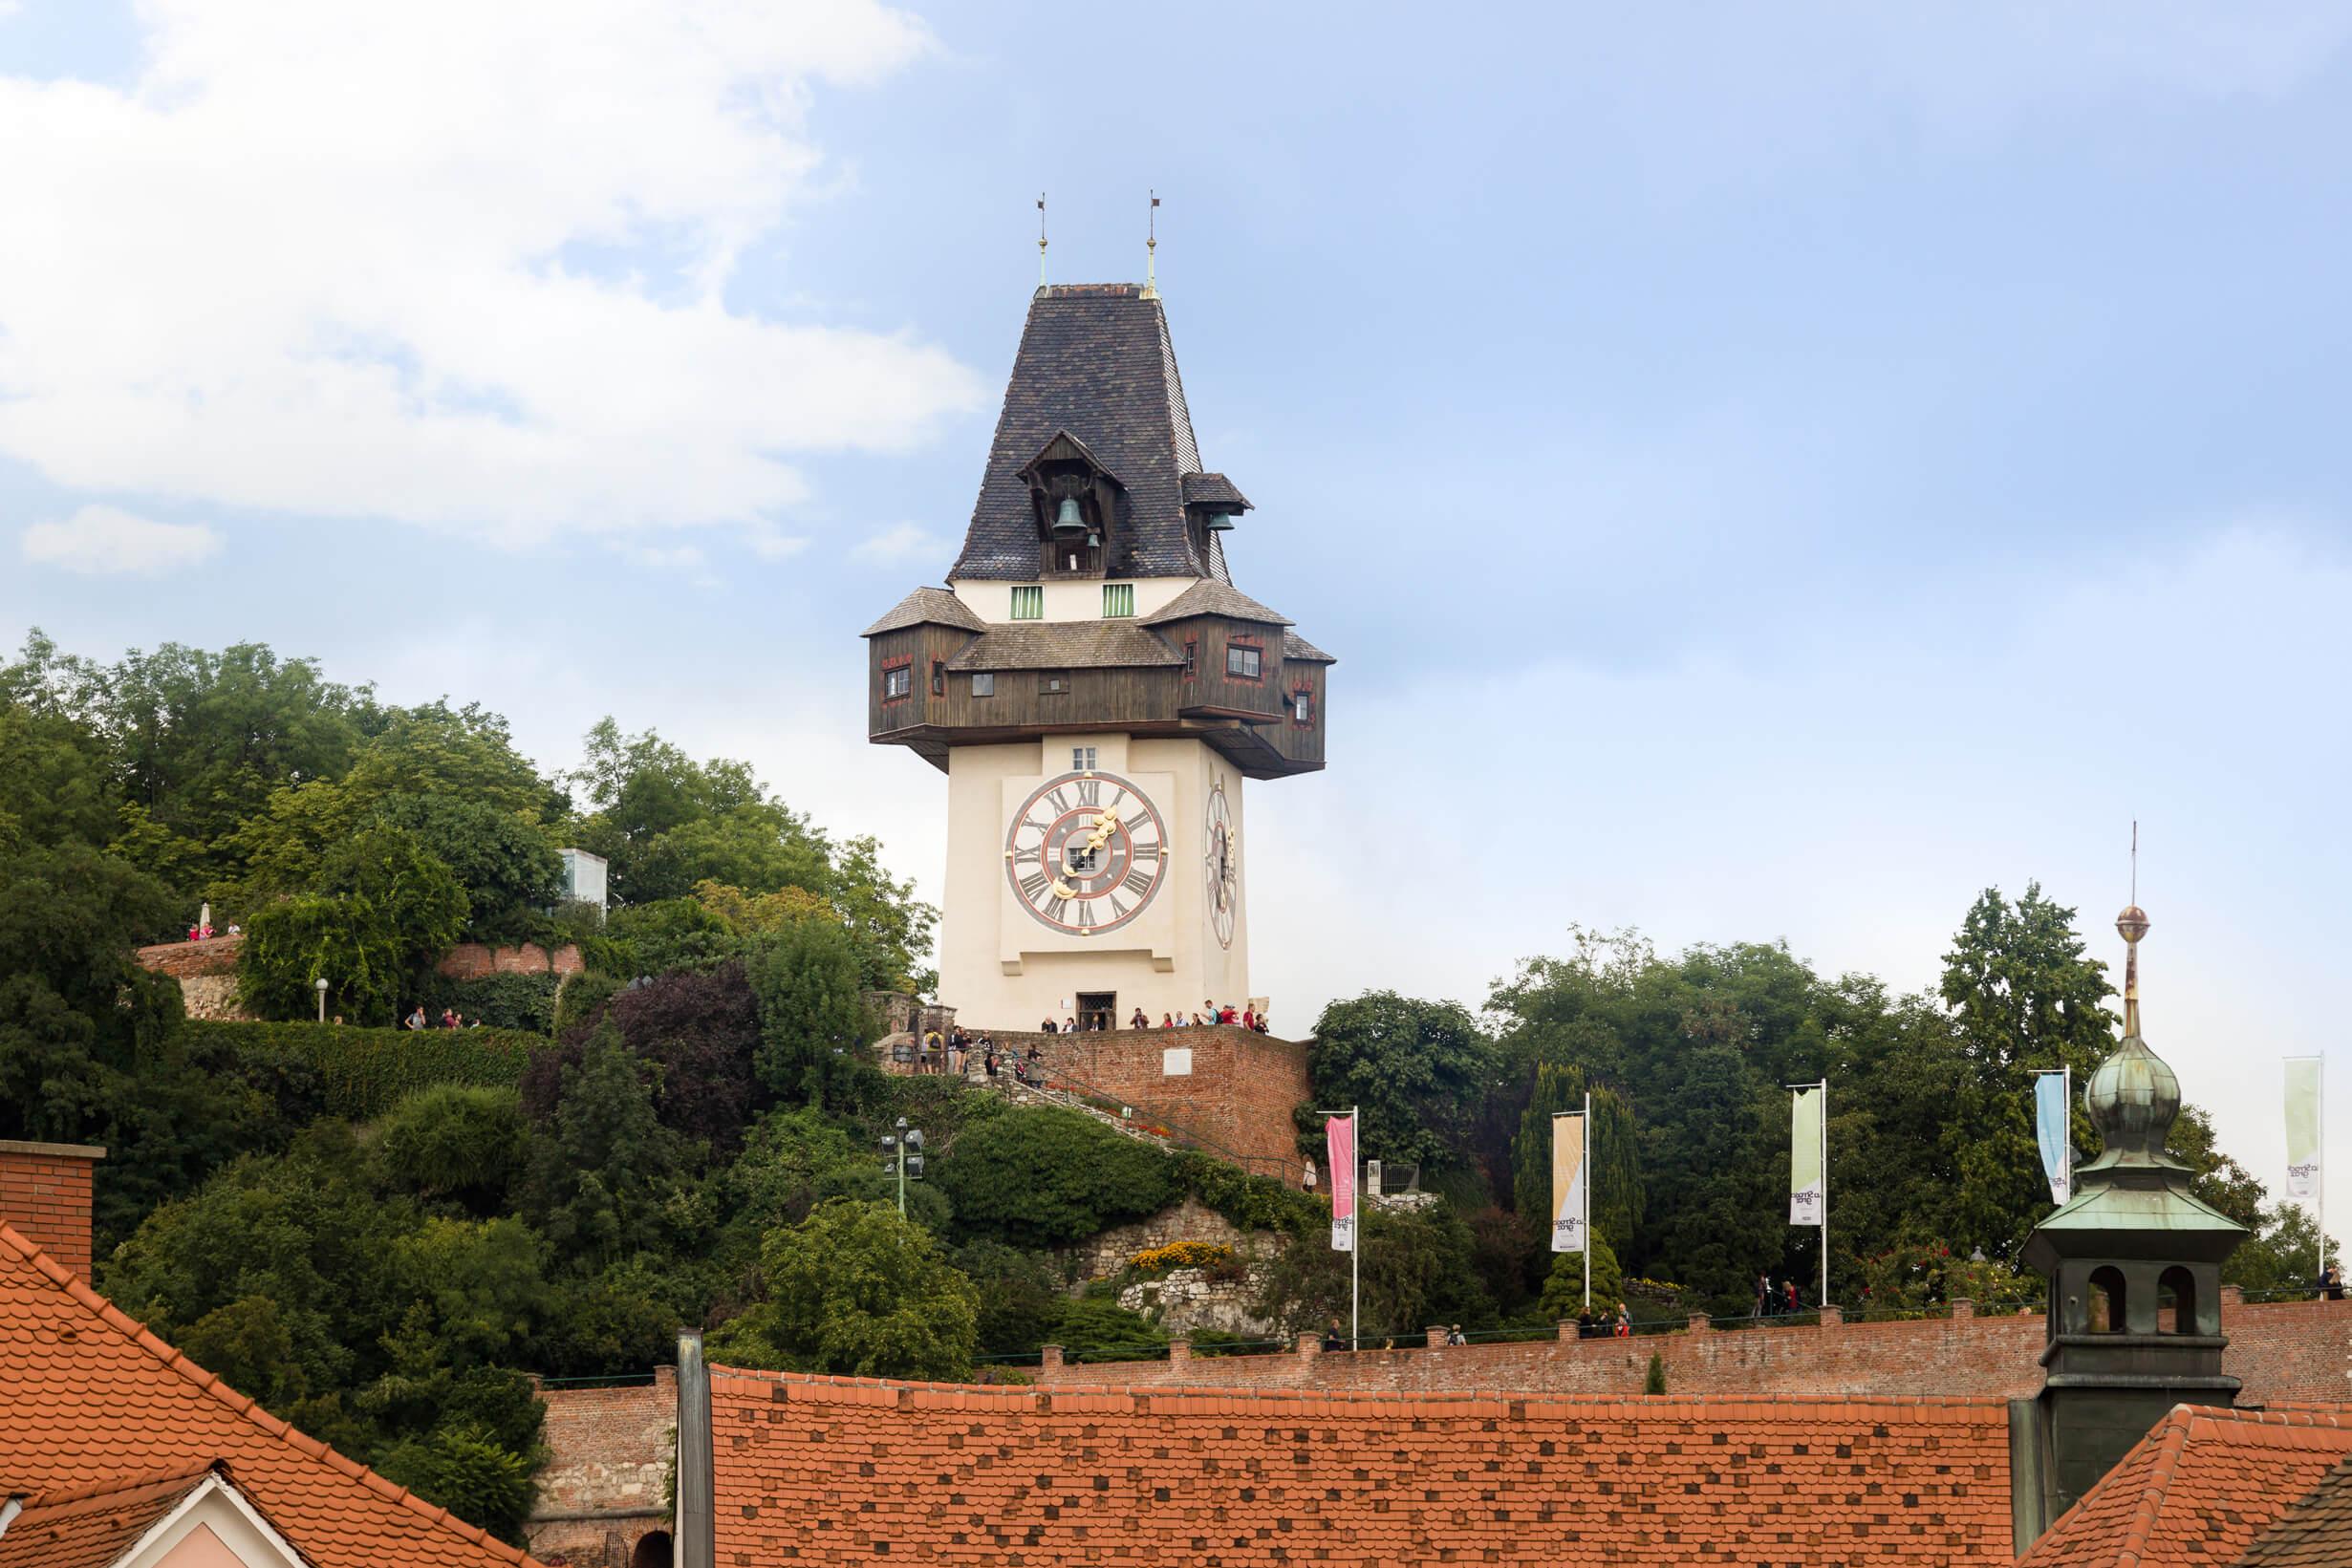 Neubauherrenmodell - Wohnen am Park 8020 Graz, Idlhofgasse 48 - Uhrturm